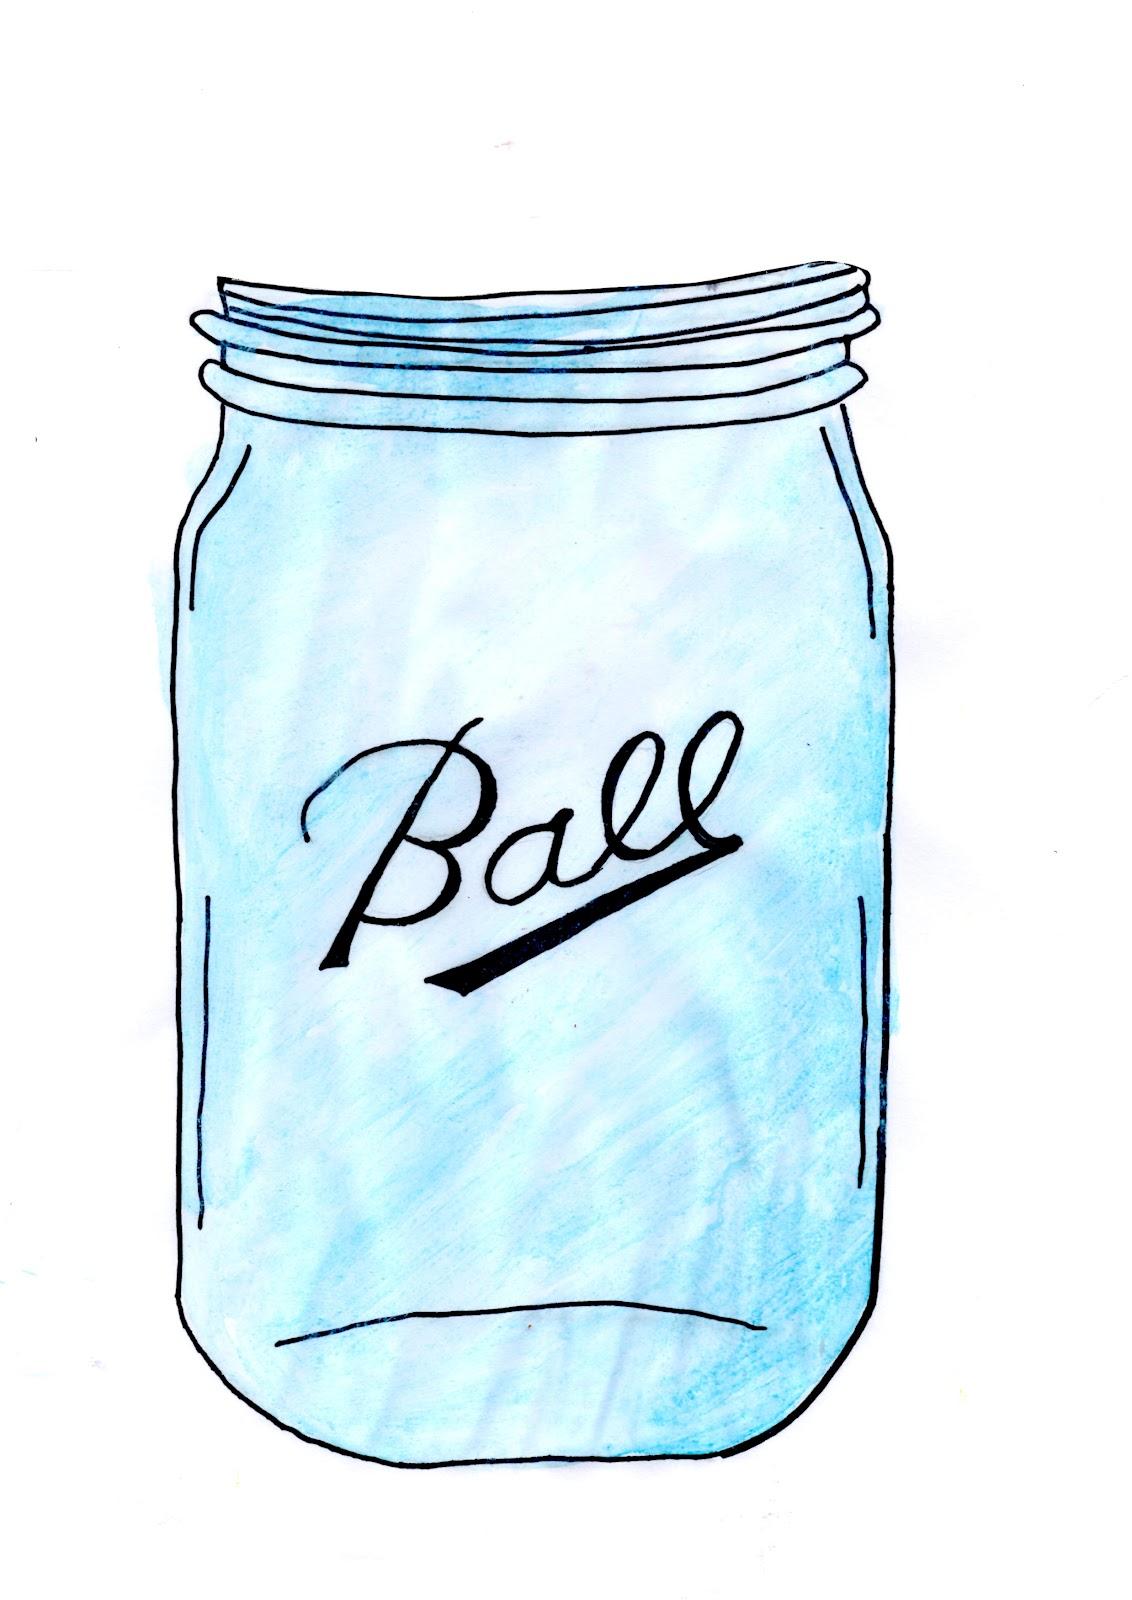 Turquoise clipart mason jar #2